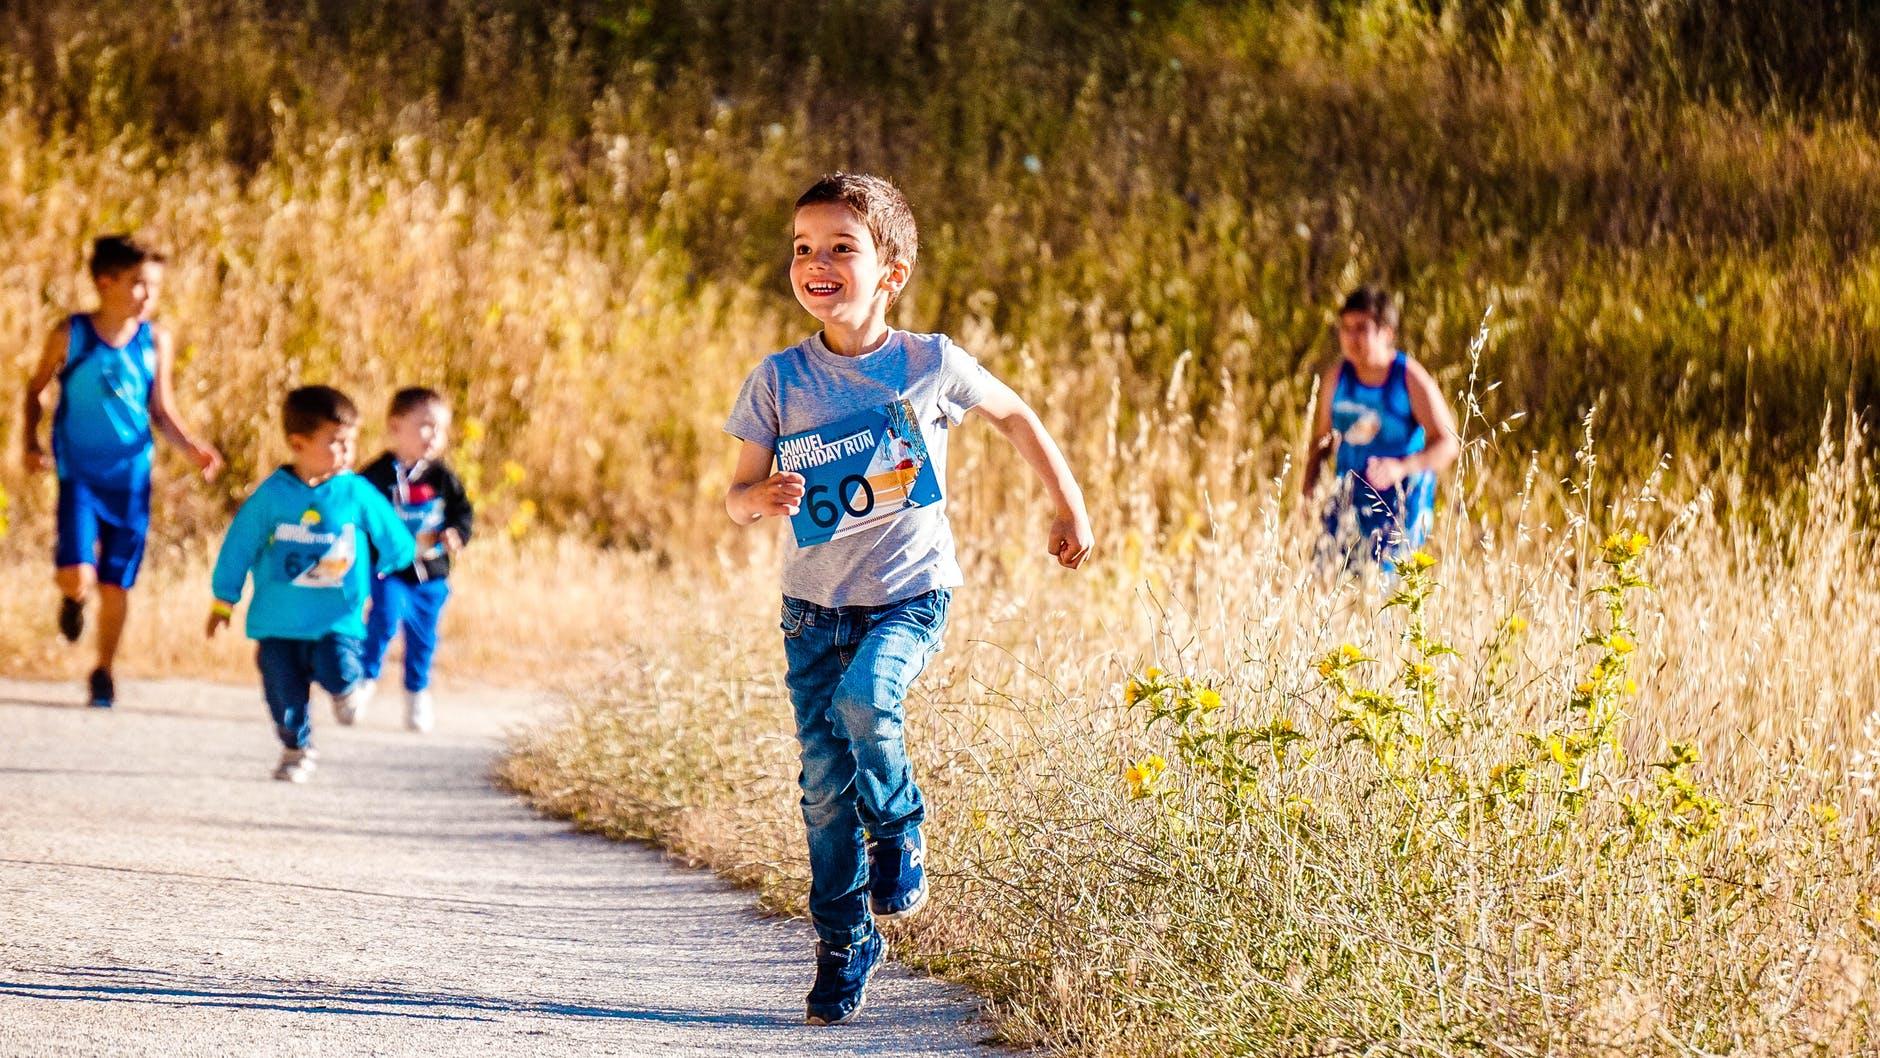 Sobrepeso Infantil - Actividades físicas - Mamás360